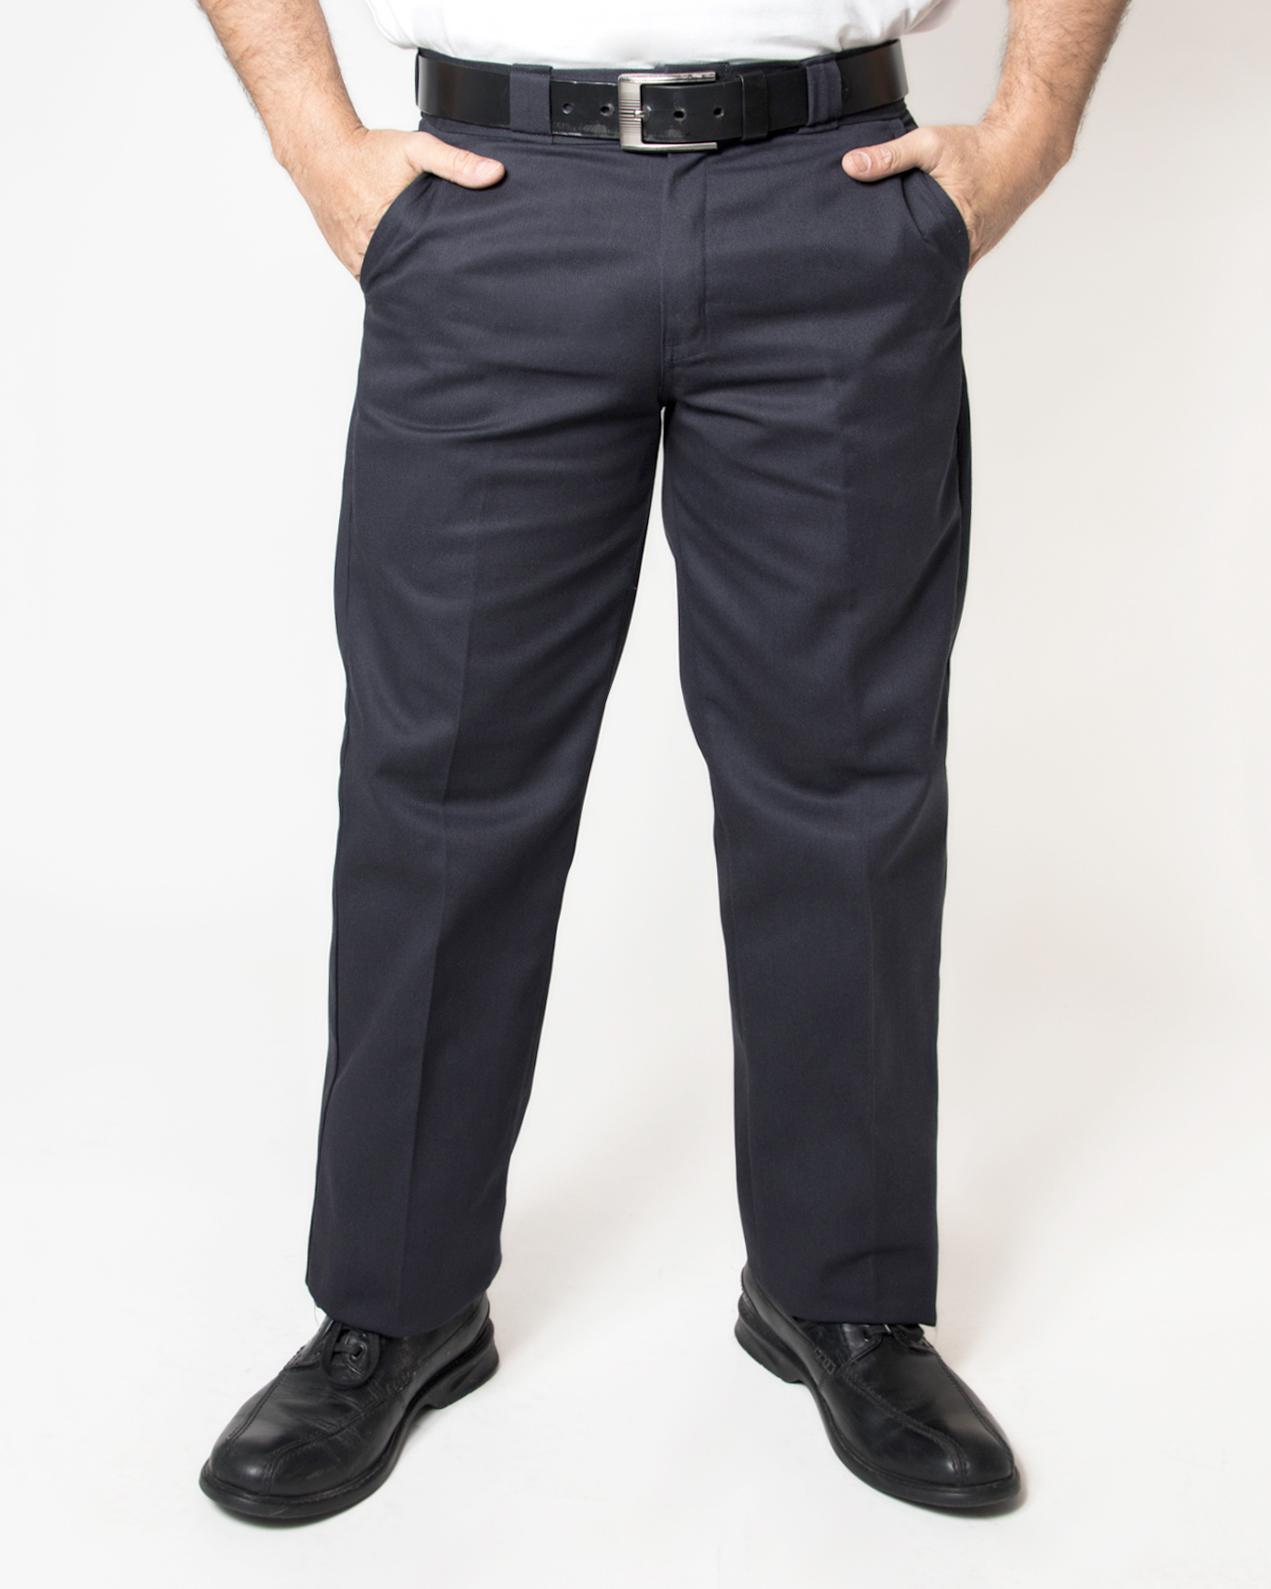 Pantalon Gabardina Para Caballero Fabricantes De Uniformes Ciudad Juarez